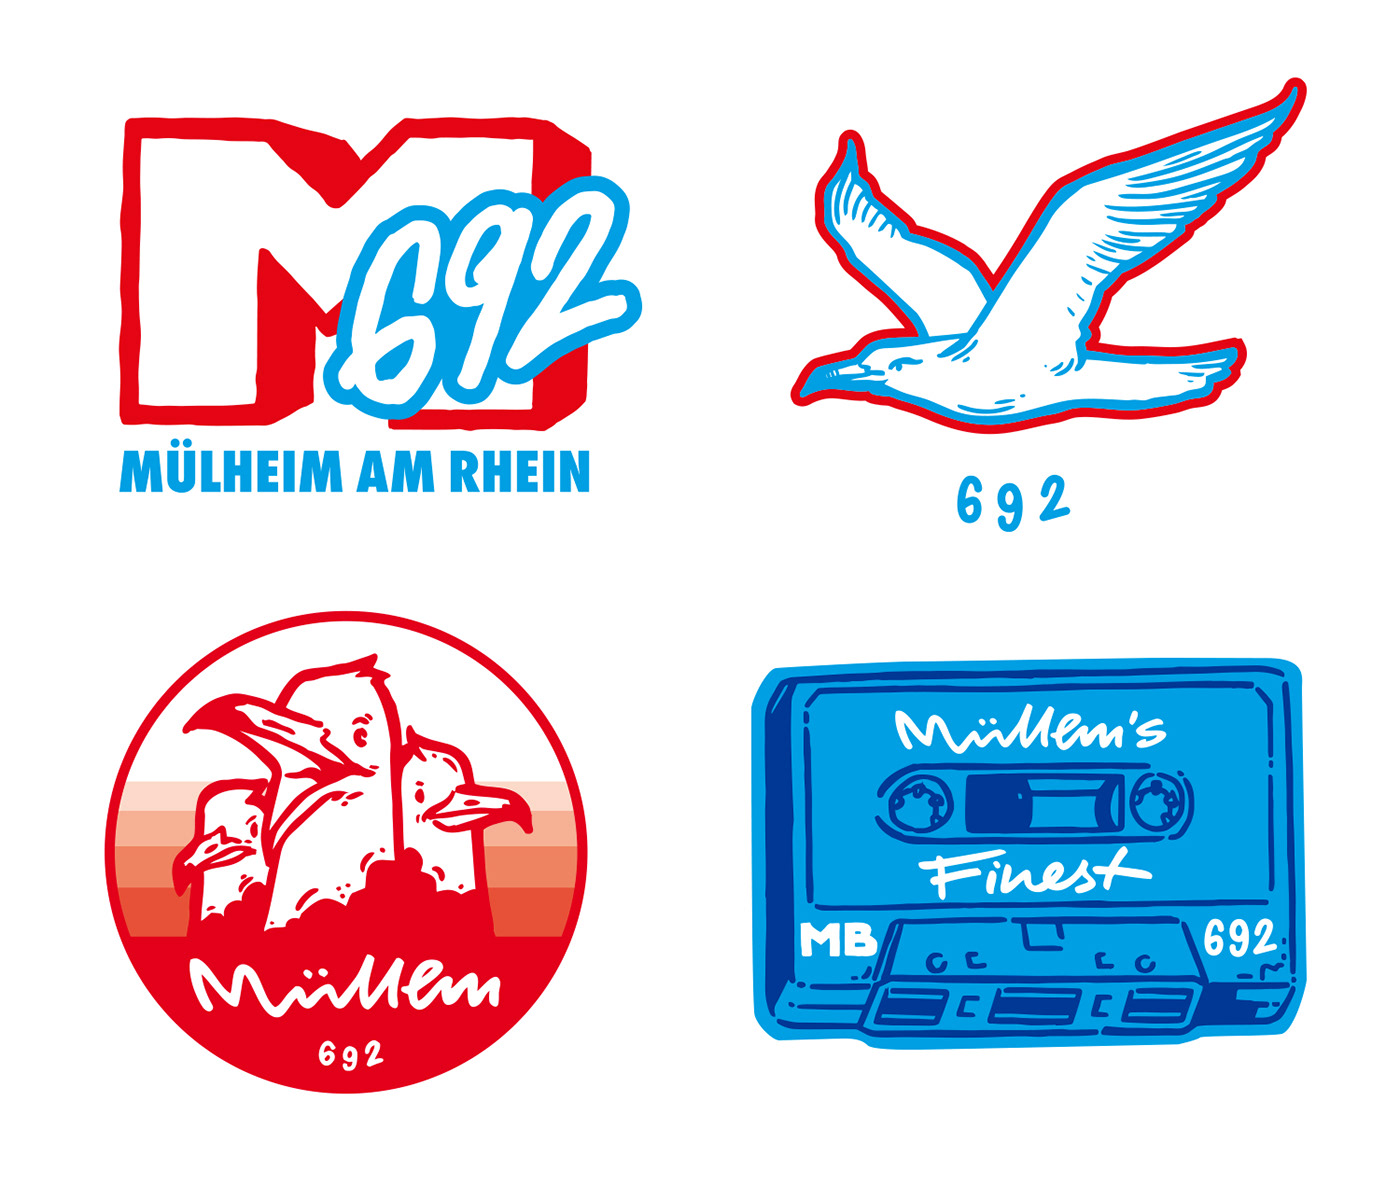 costumtype lettering Stickerdesign stickers